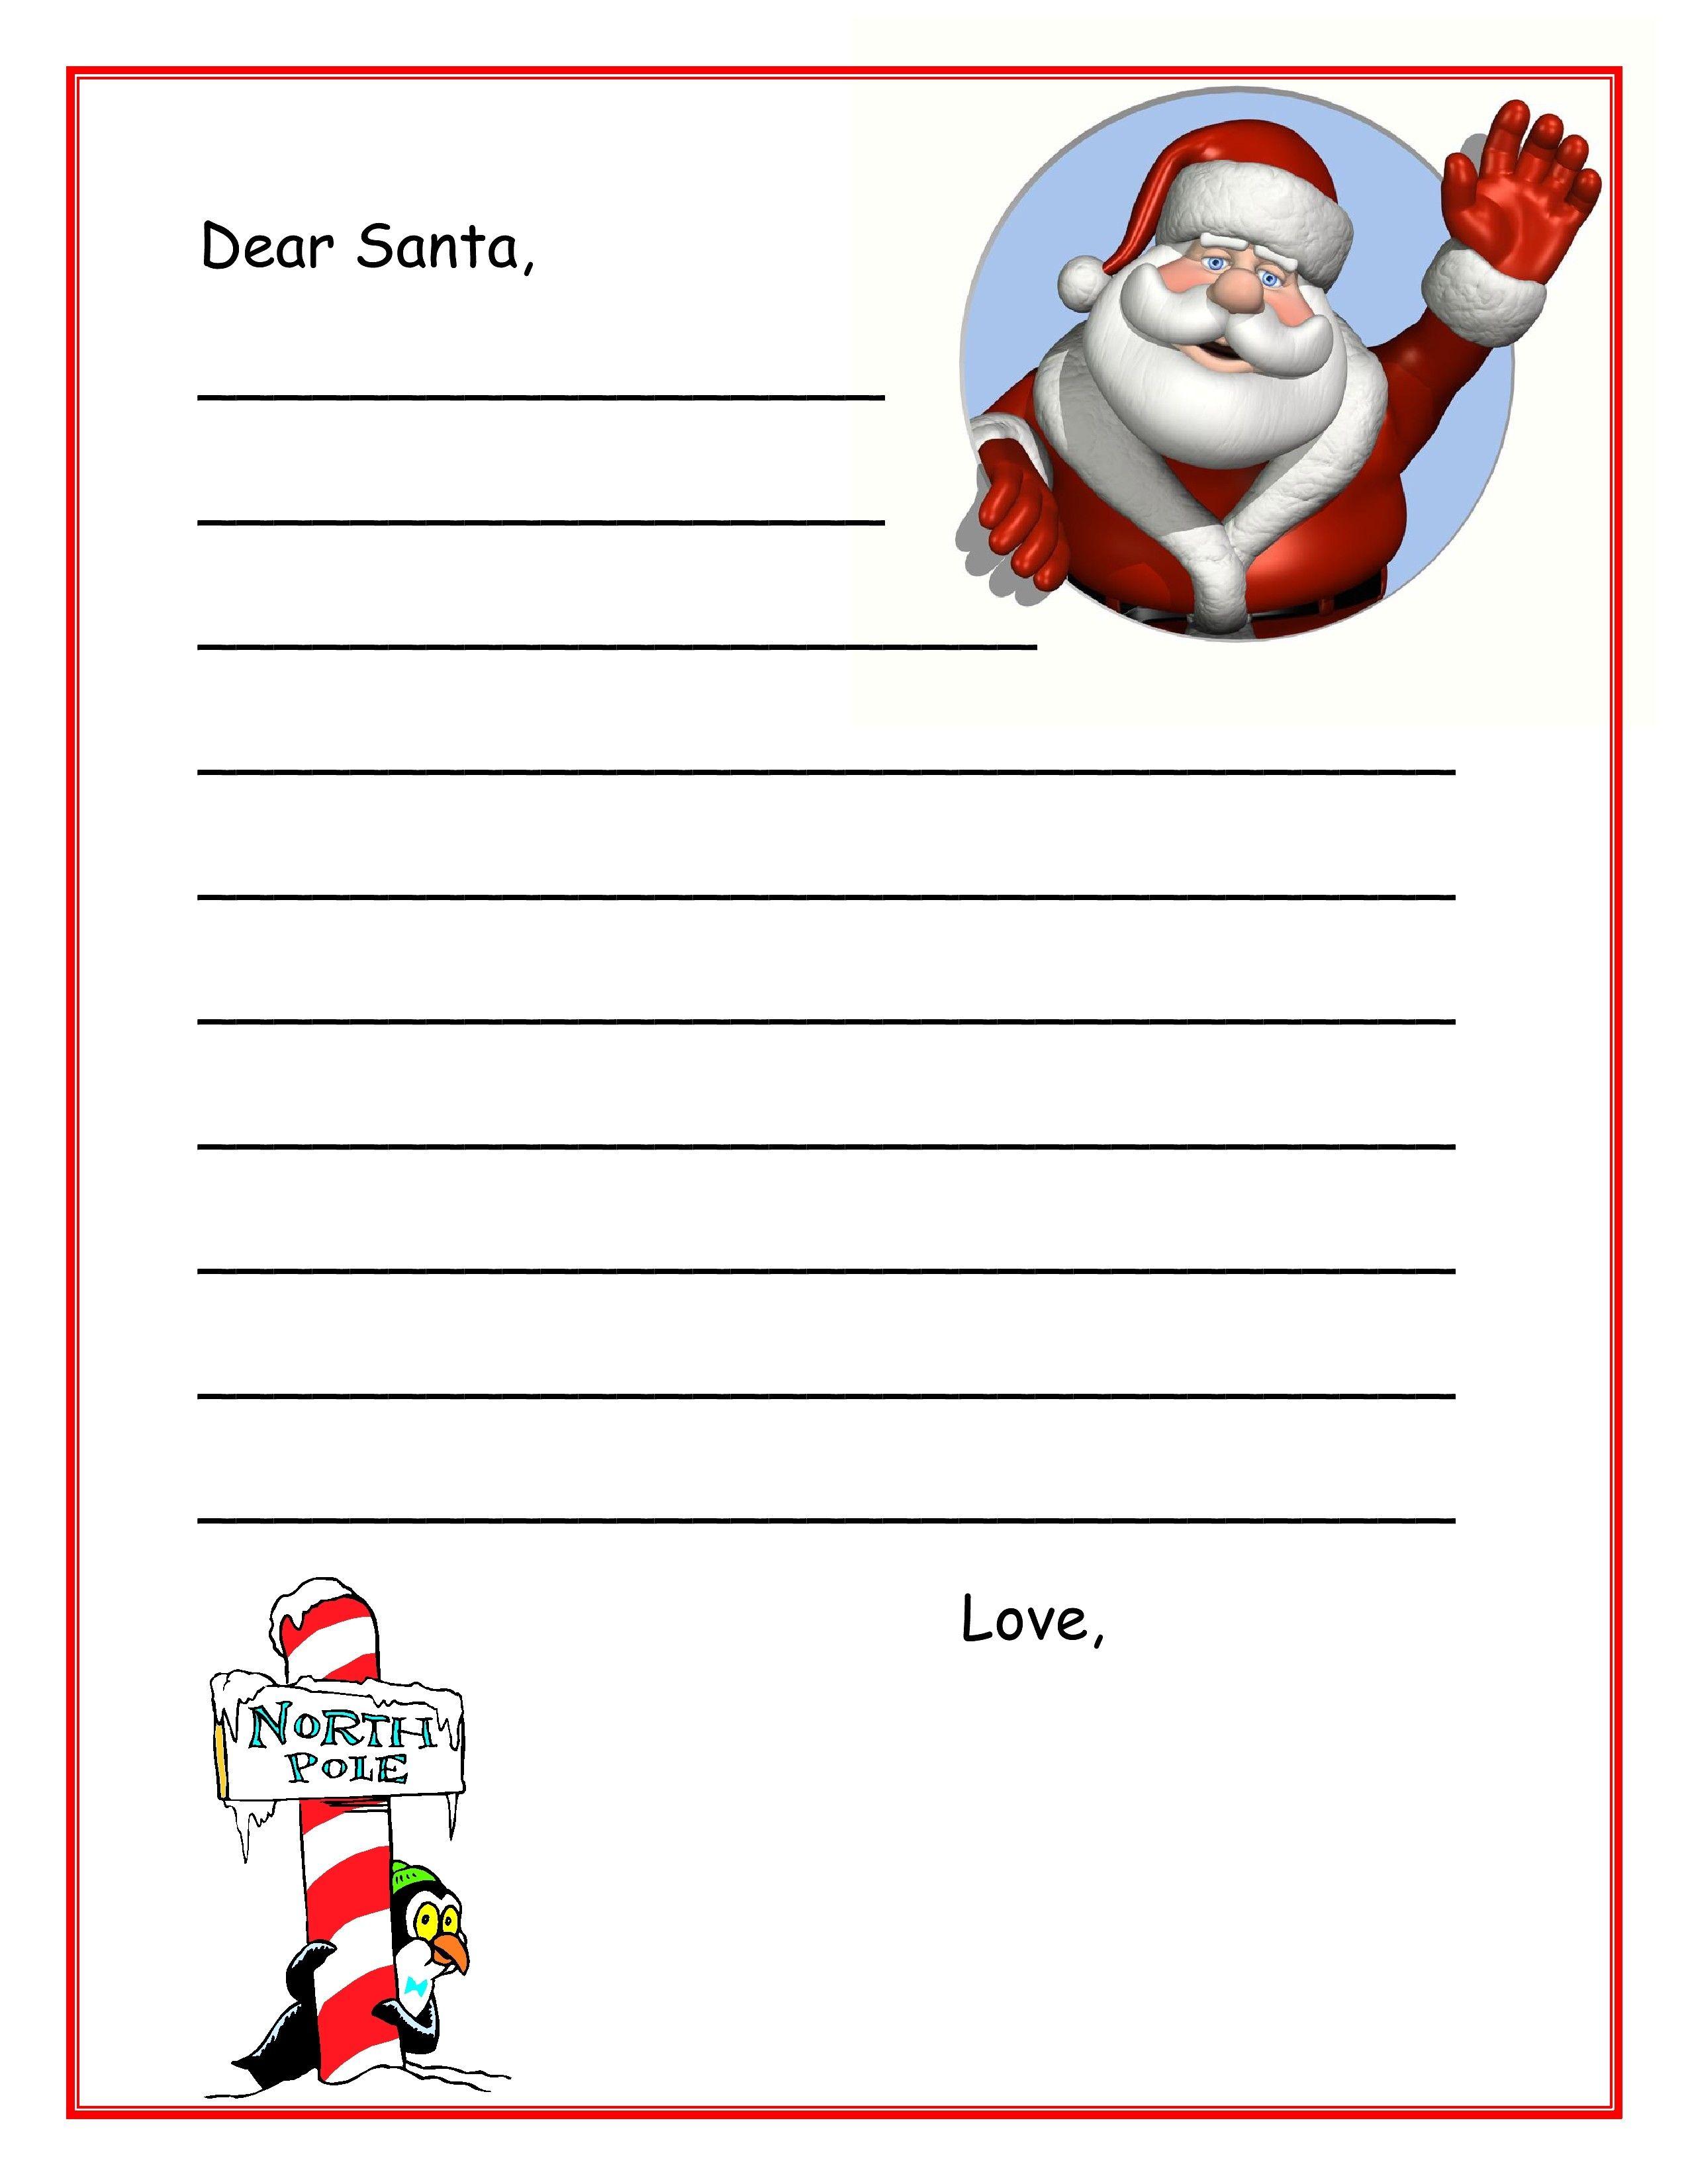 Dear Santa 2 001 Printable Stationary For Kids To Write